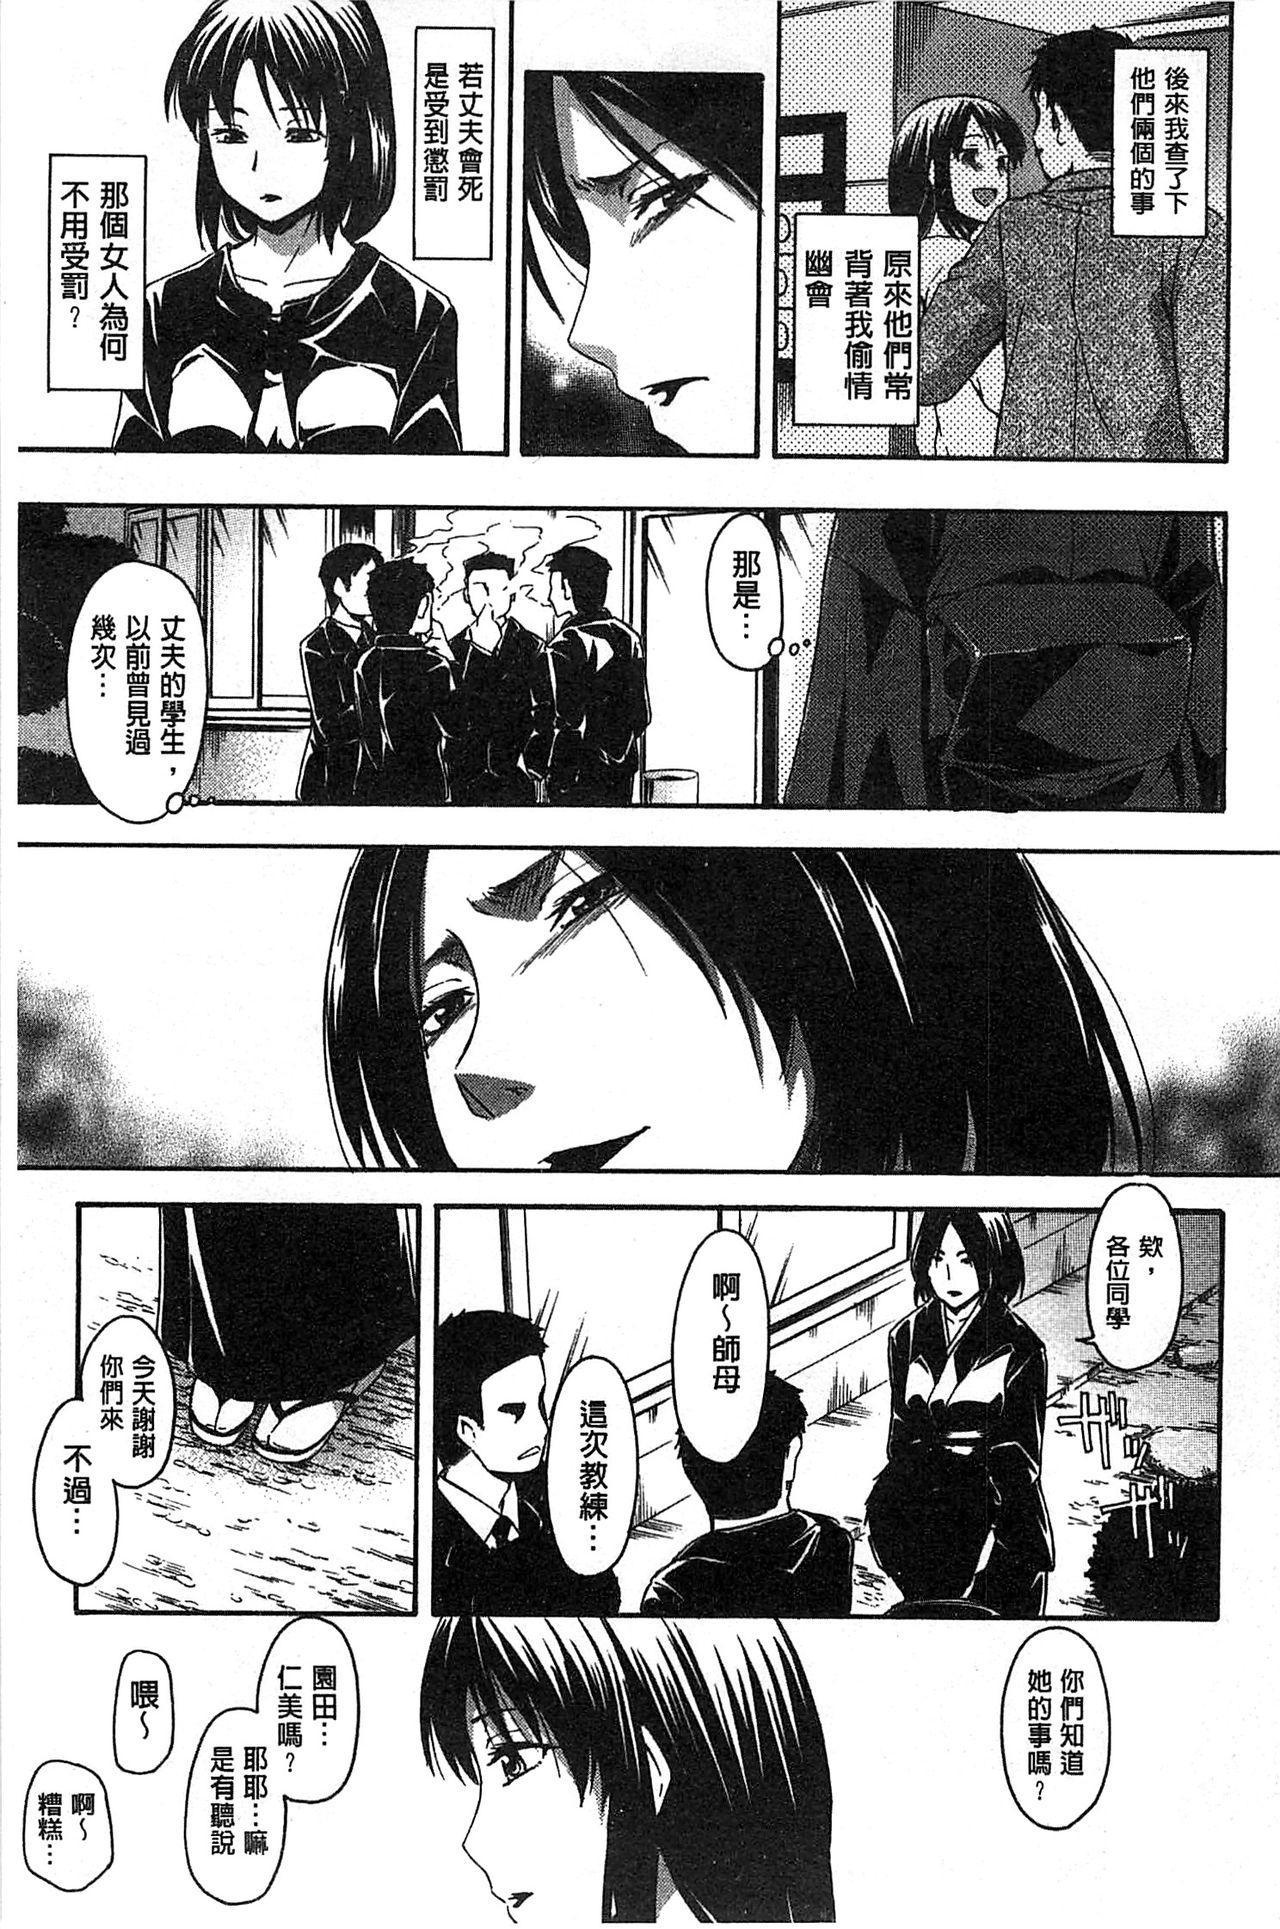 Kokoro Gohoubi | 心靈的褒美 147